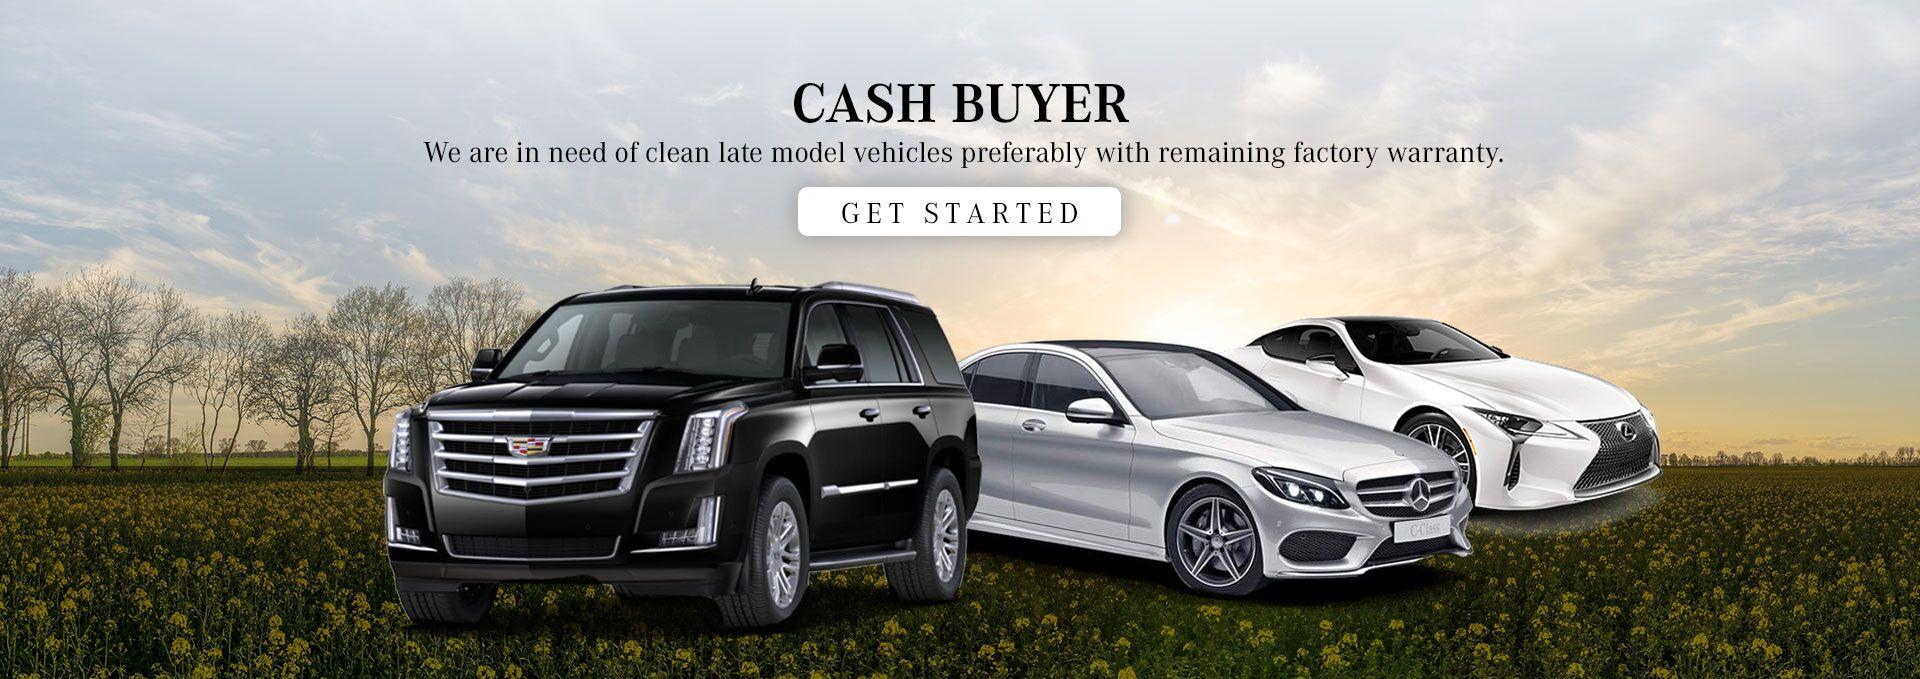 Used Car Dealership Memphis TN | Used Cars Smith Imports